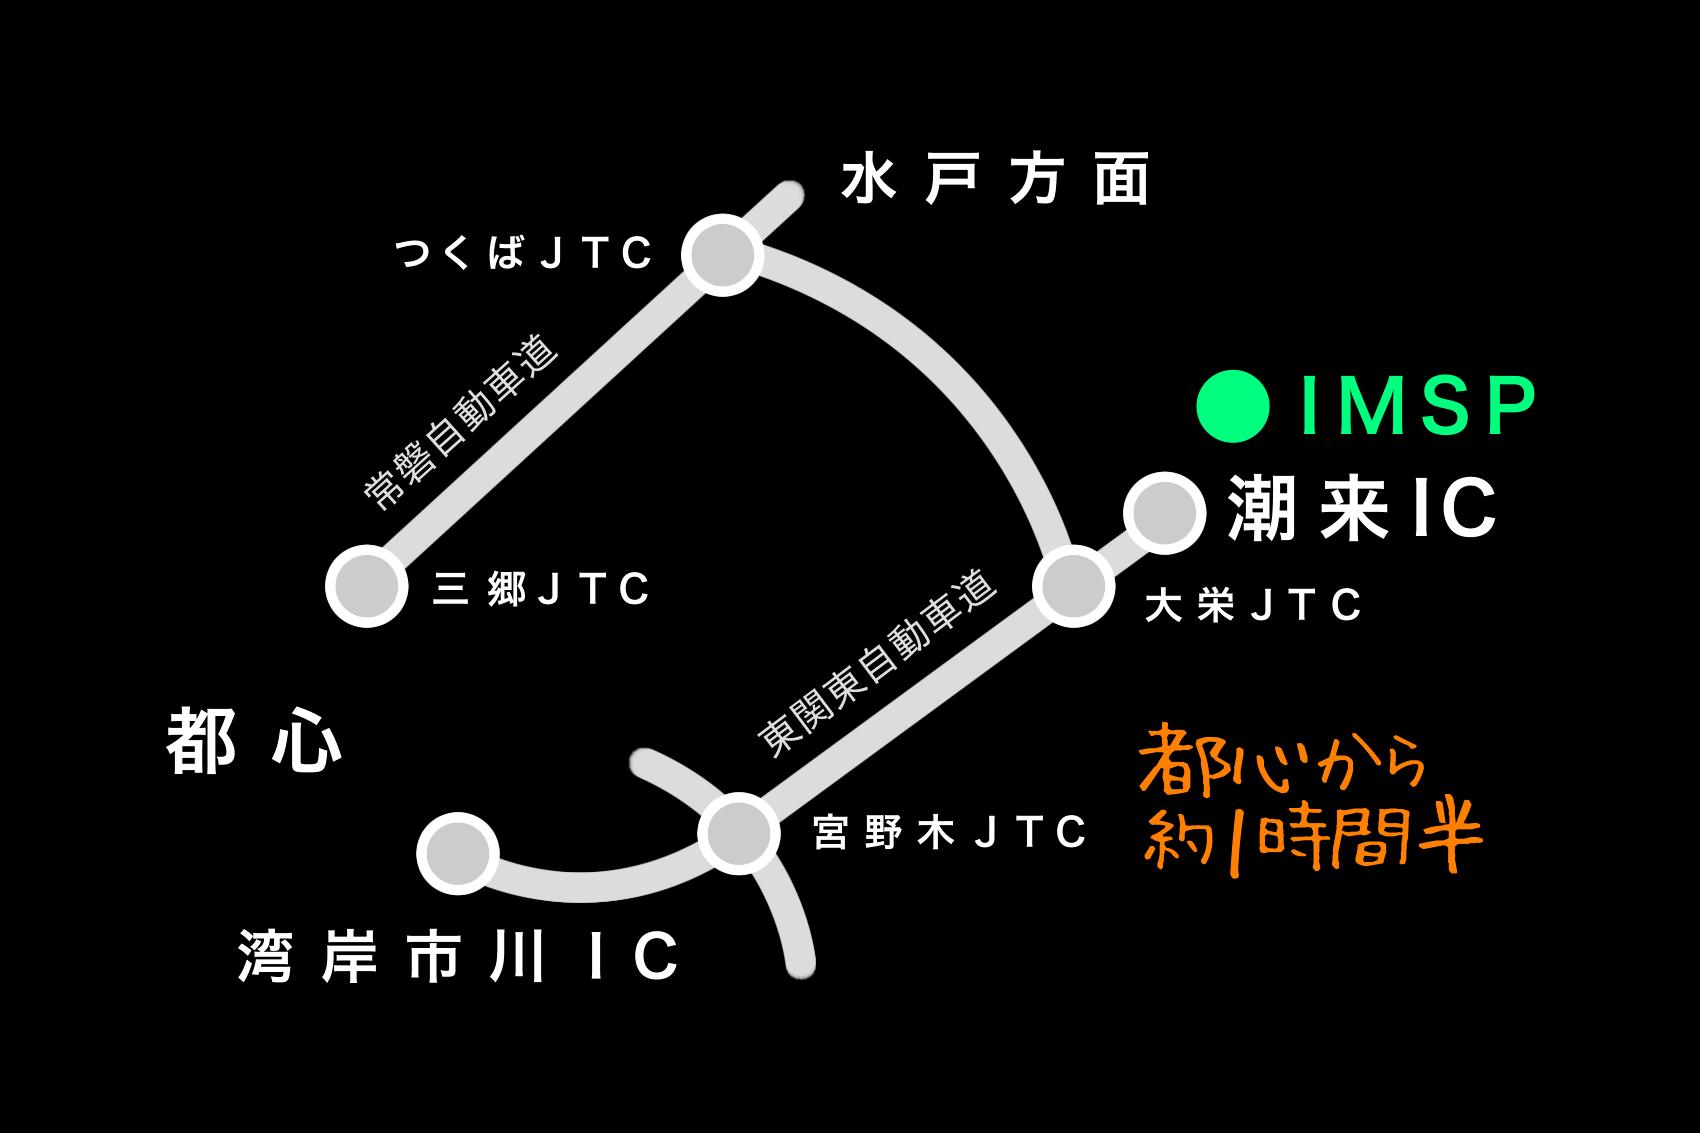 IMSPアクセスマップ